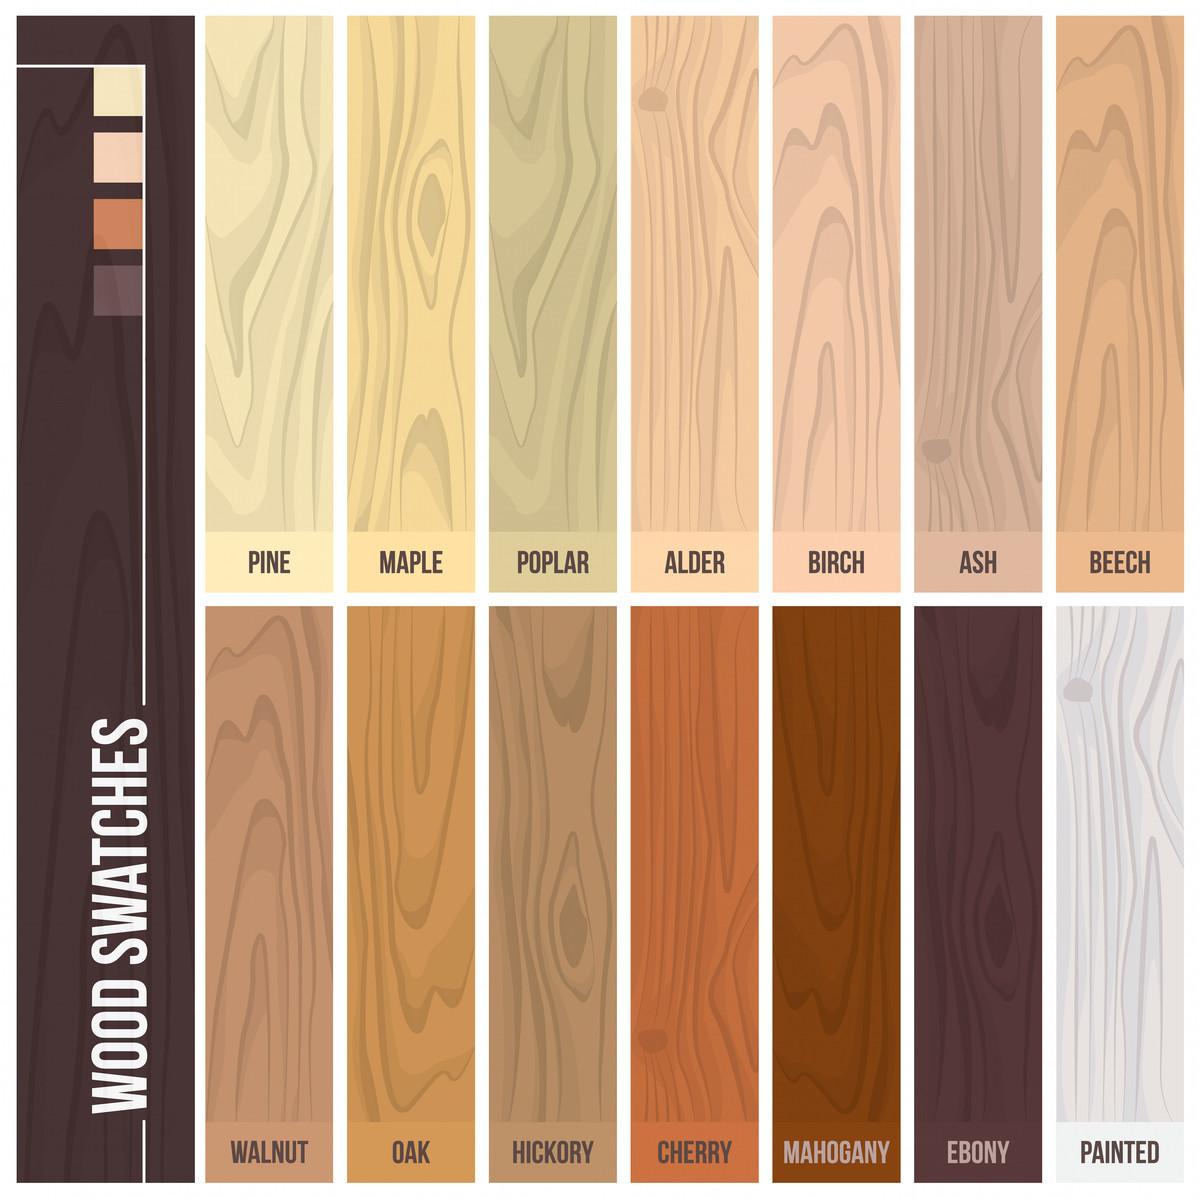 engineered hardwood flooring vs hardwood flooring of 12 types of hardwood flooring species styles edging dimensions throughout types of hardwood flooring illustrated guide